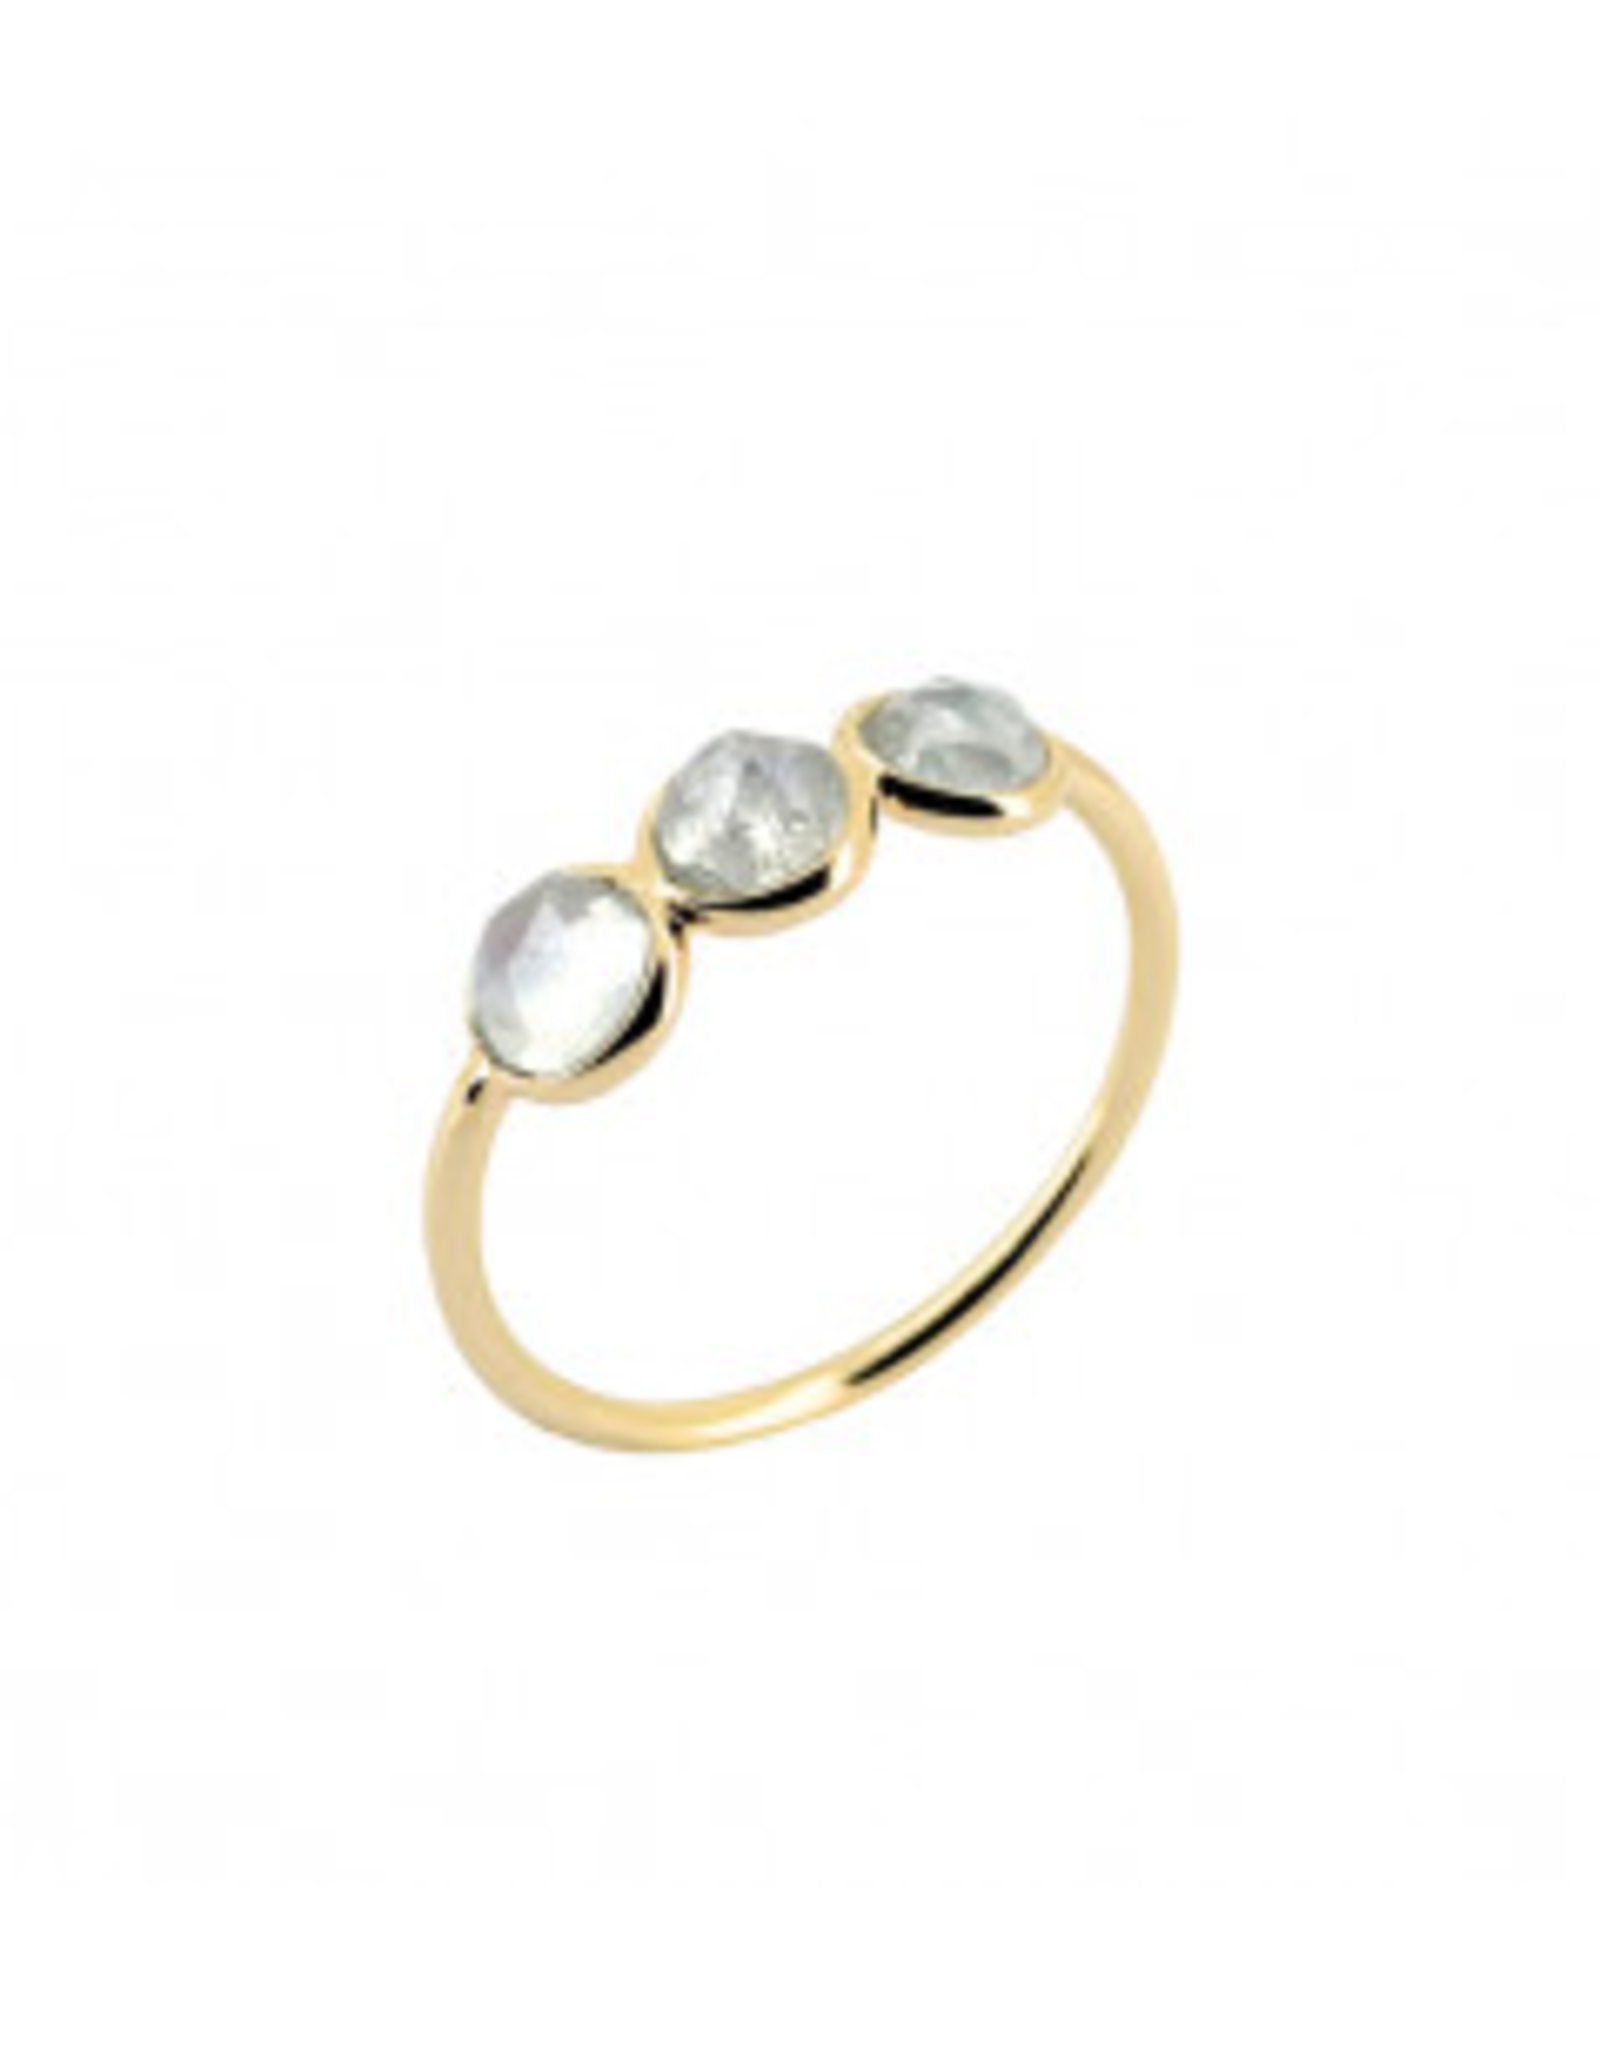 Sophie Deschamps Ring moonstone size 54